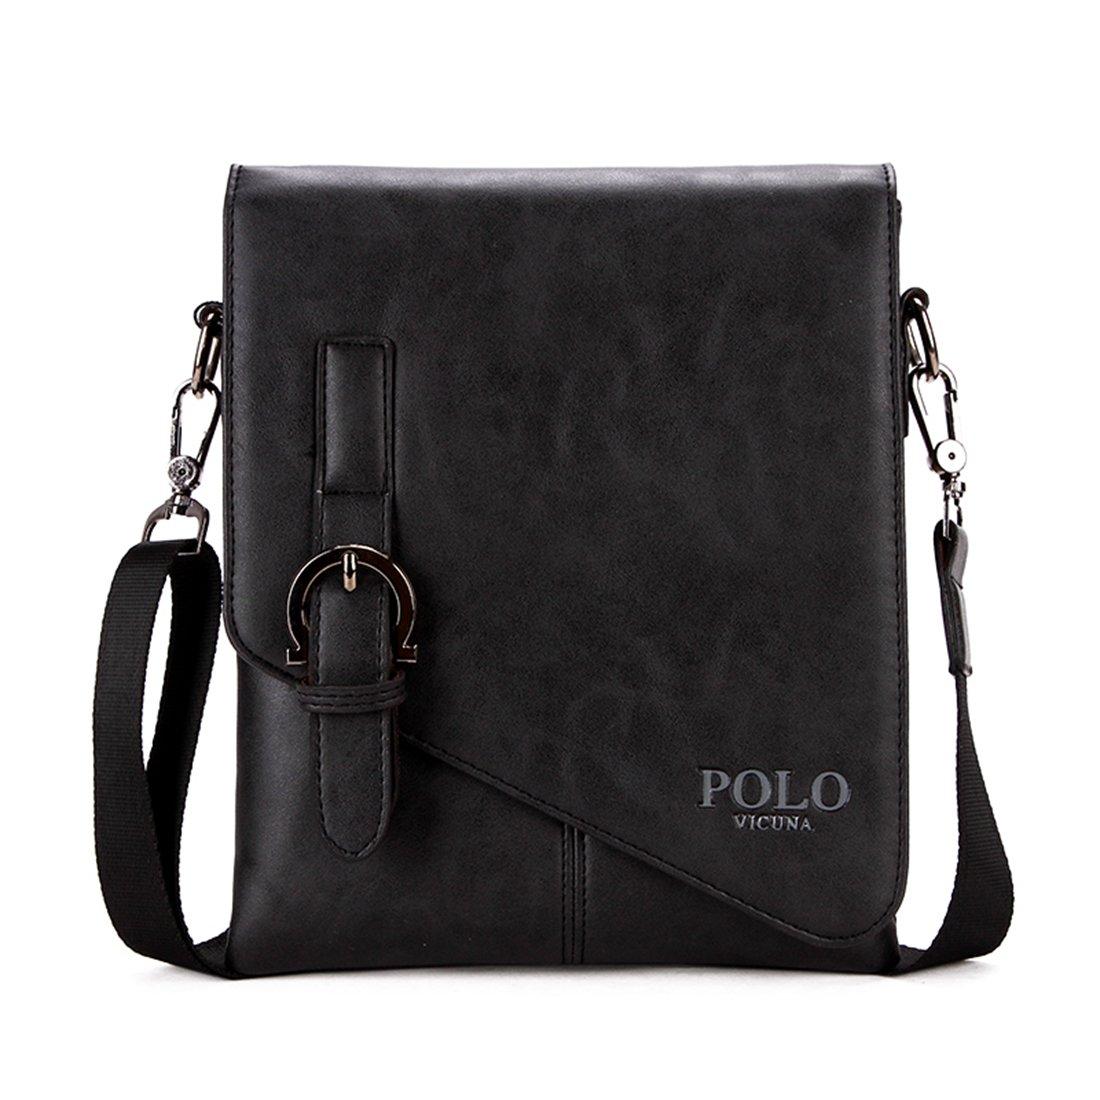 VICUNA POLO Men Shoulder Bag Messenger Bag Men Bag Crossbody Bag For ipad (black)